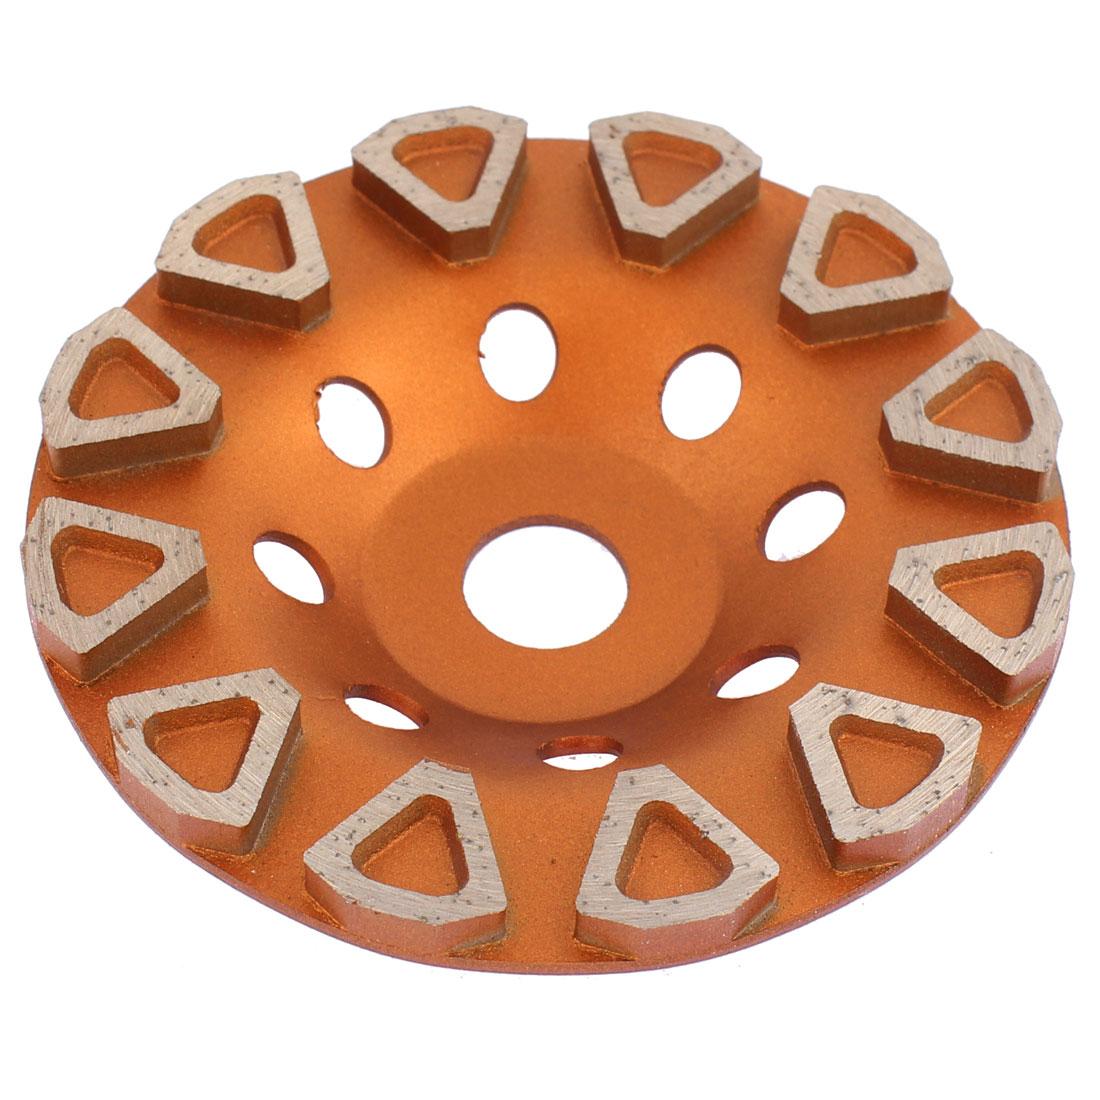 Diamond Cutting Disc 4 Inch Dia 7mm Thickness Saw Cutter Brass Tone